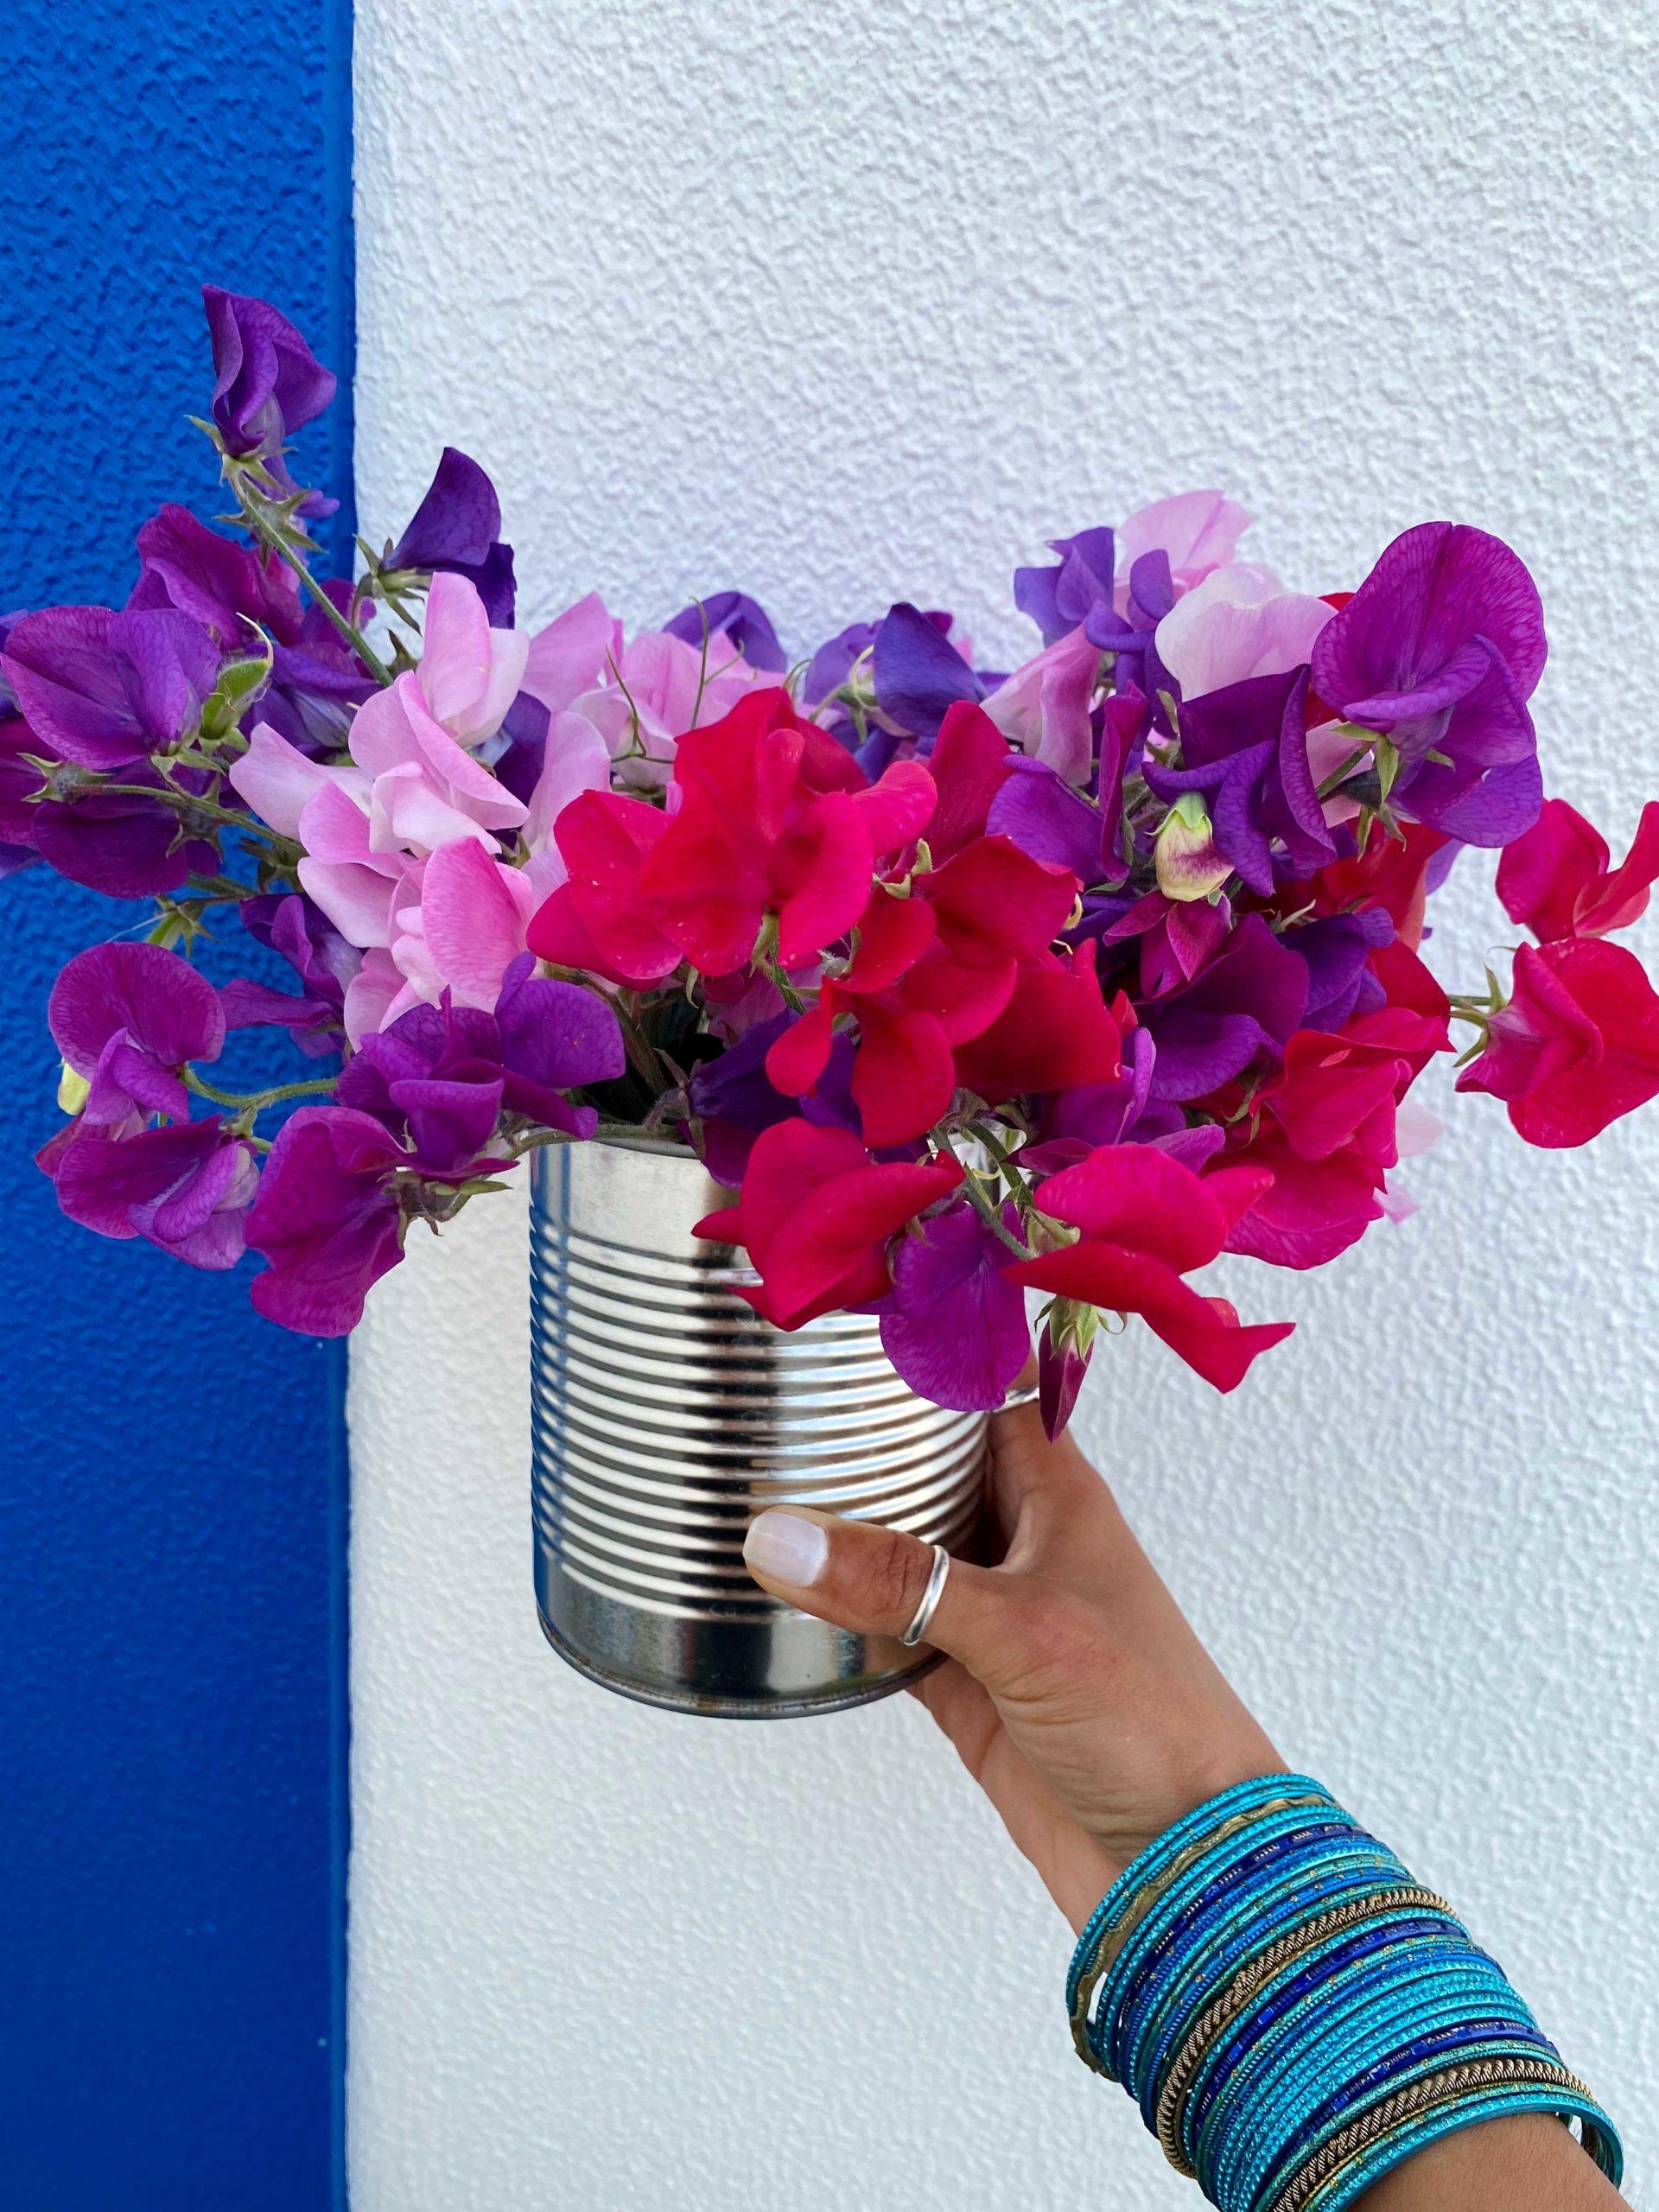 Ervilhas-de-cheiro - Aprenda a cuidar desta planta